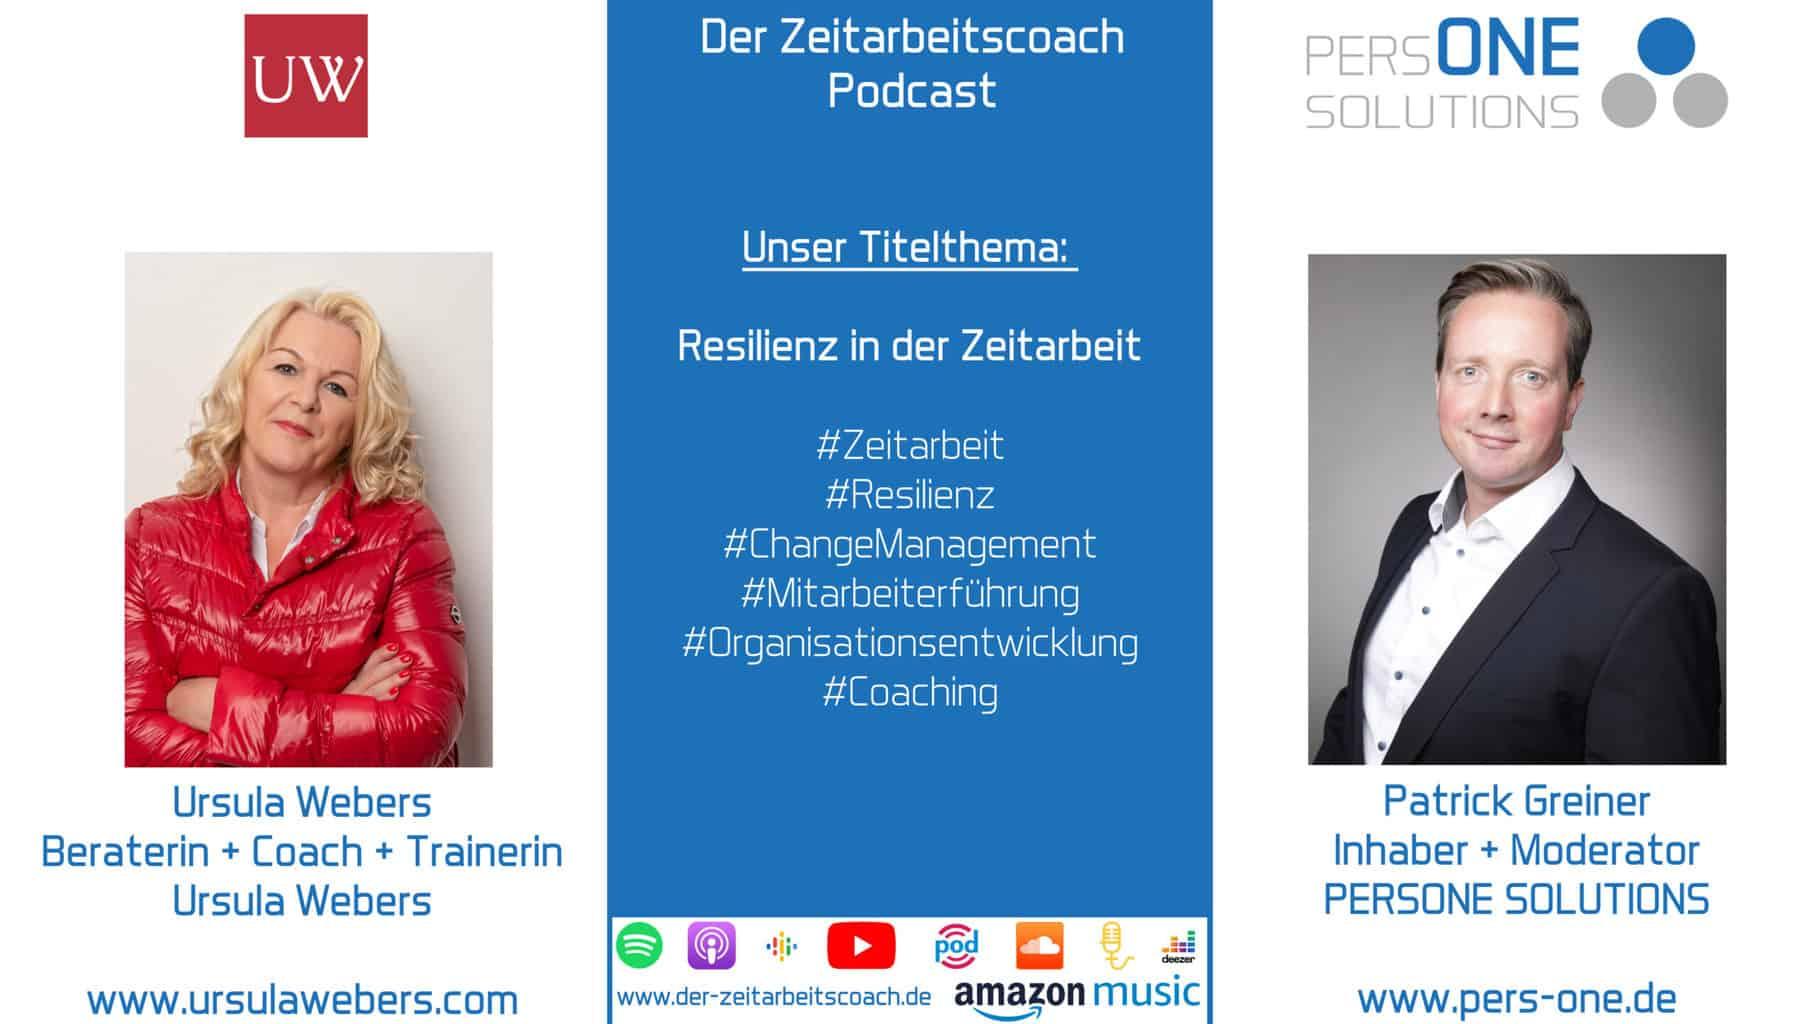 Webers, Ursula_Podcast YT-SM Grafik_Zeitarbeitscoach Podcast